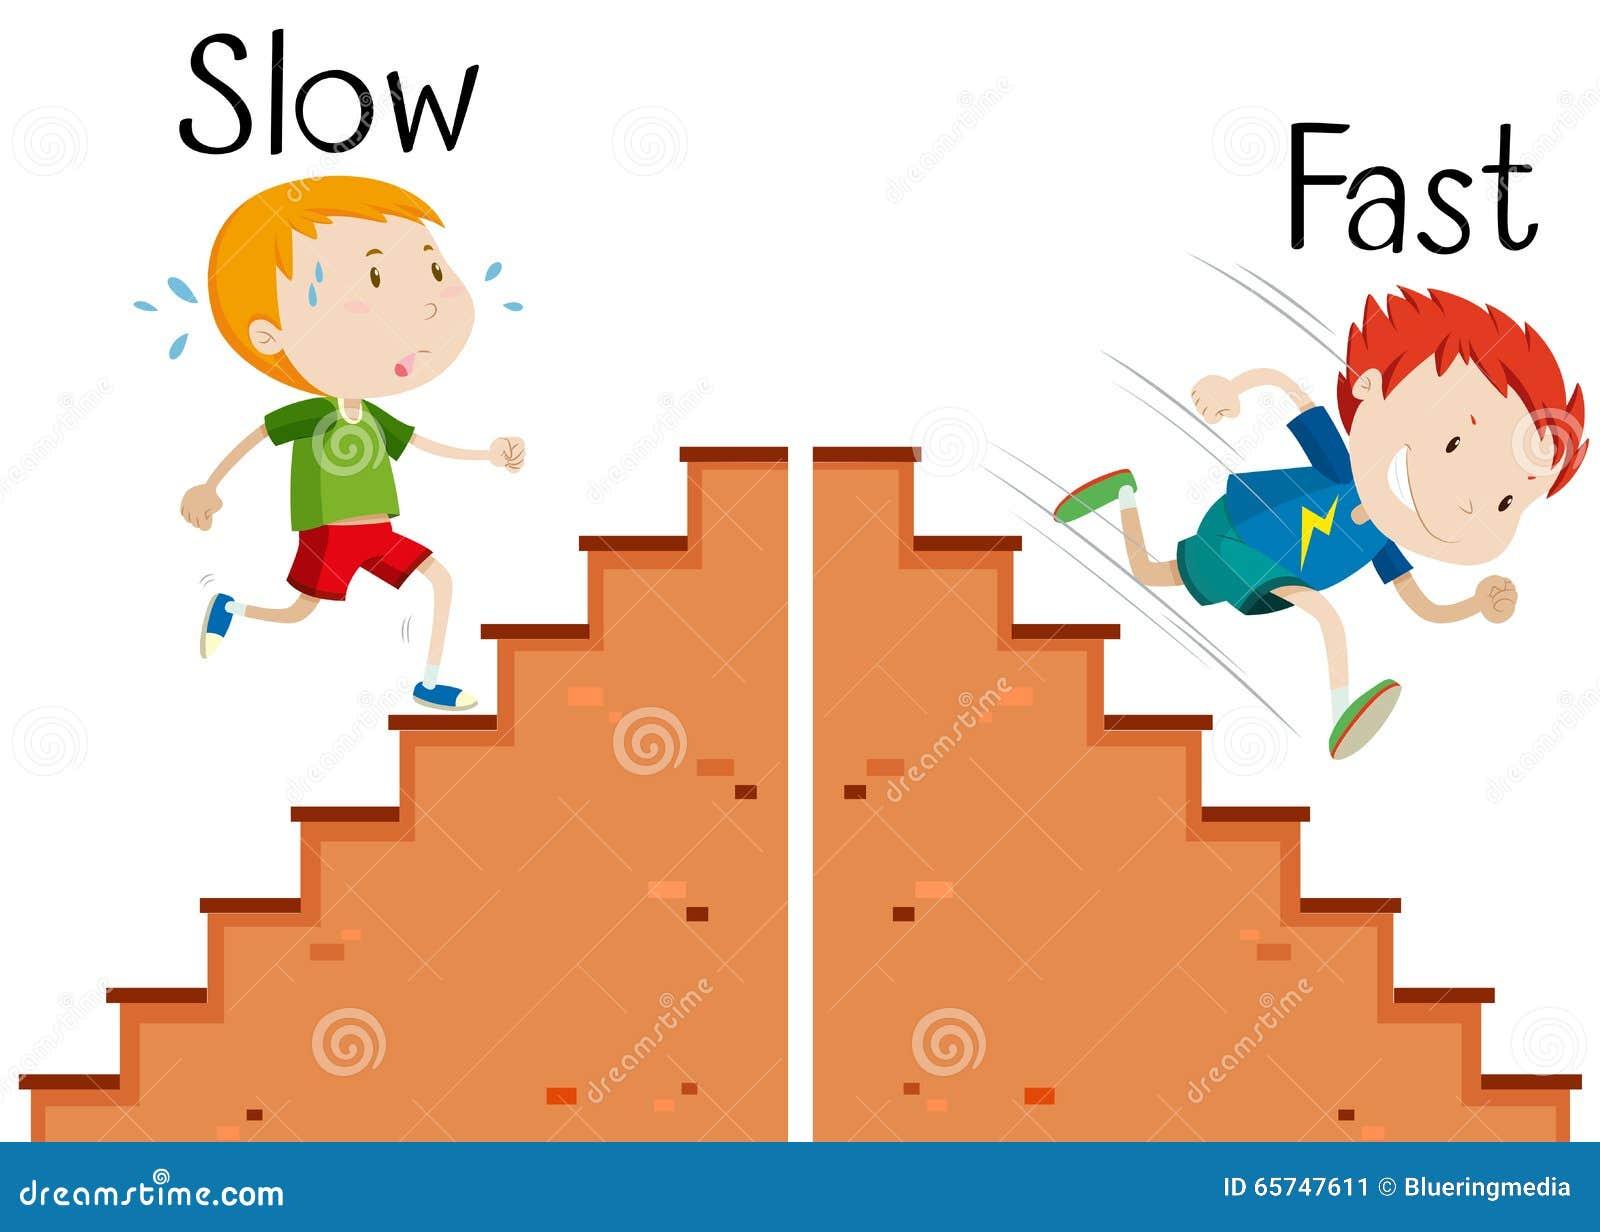 how to make ti me go fast